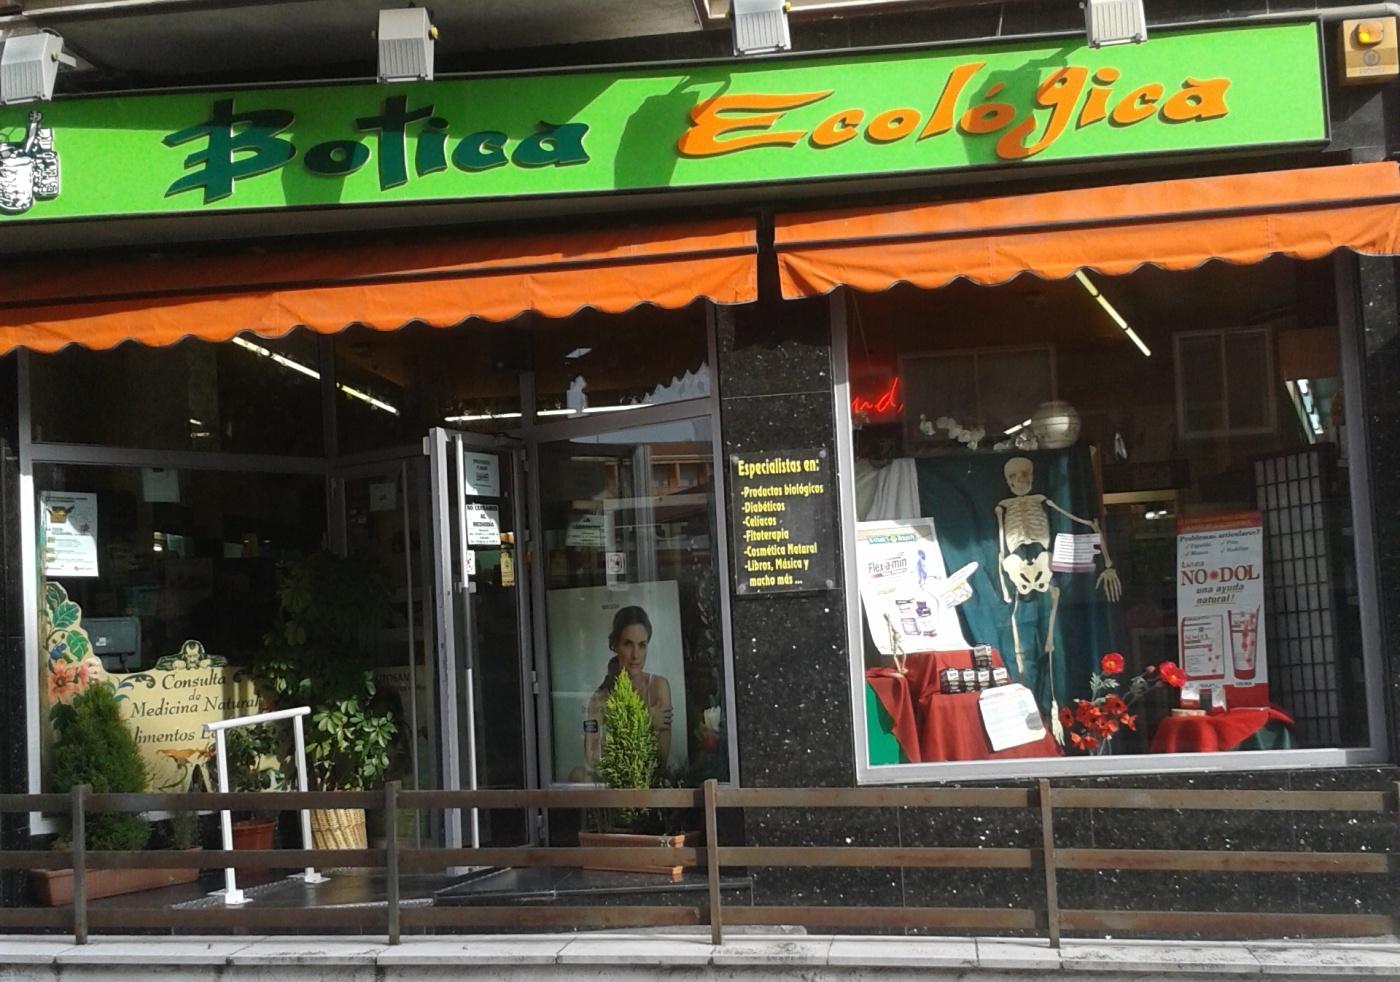 mercado ecologico madrid supermarkets ecological